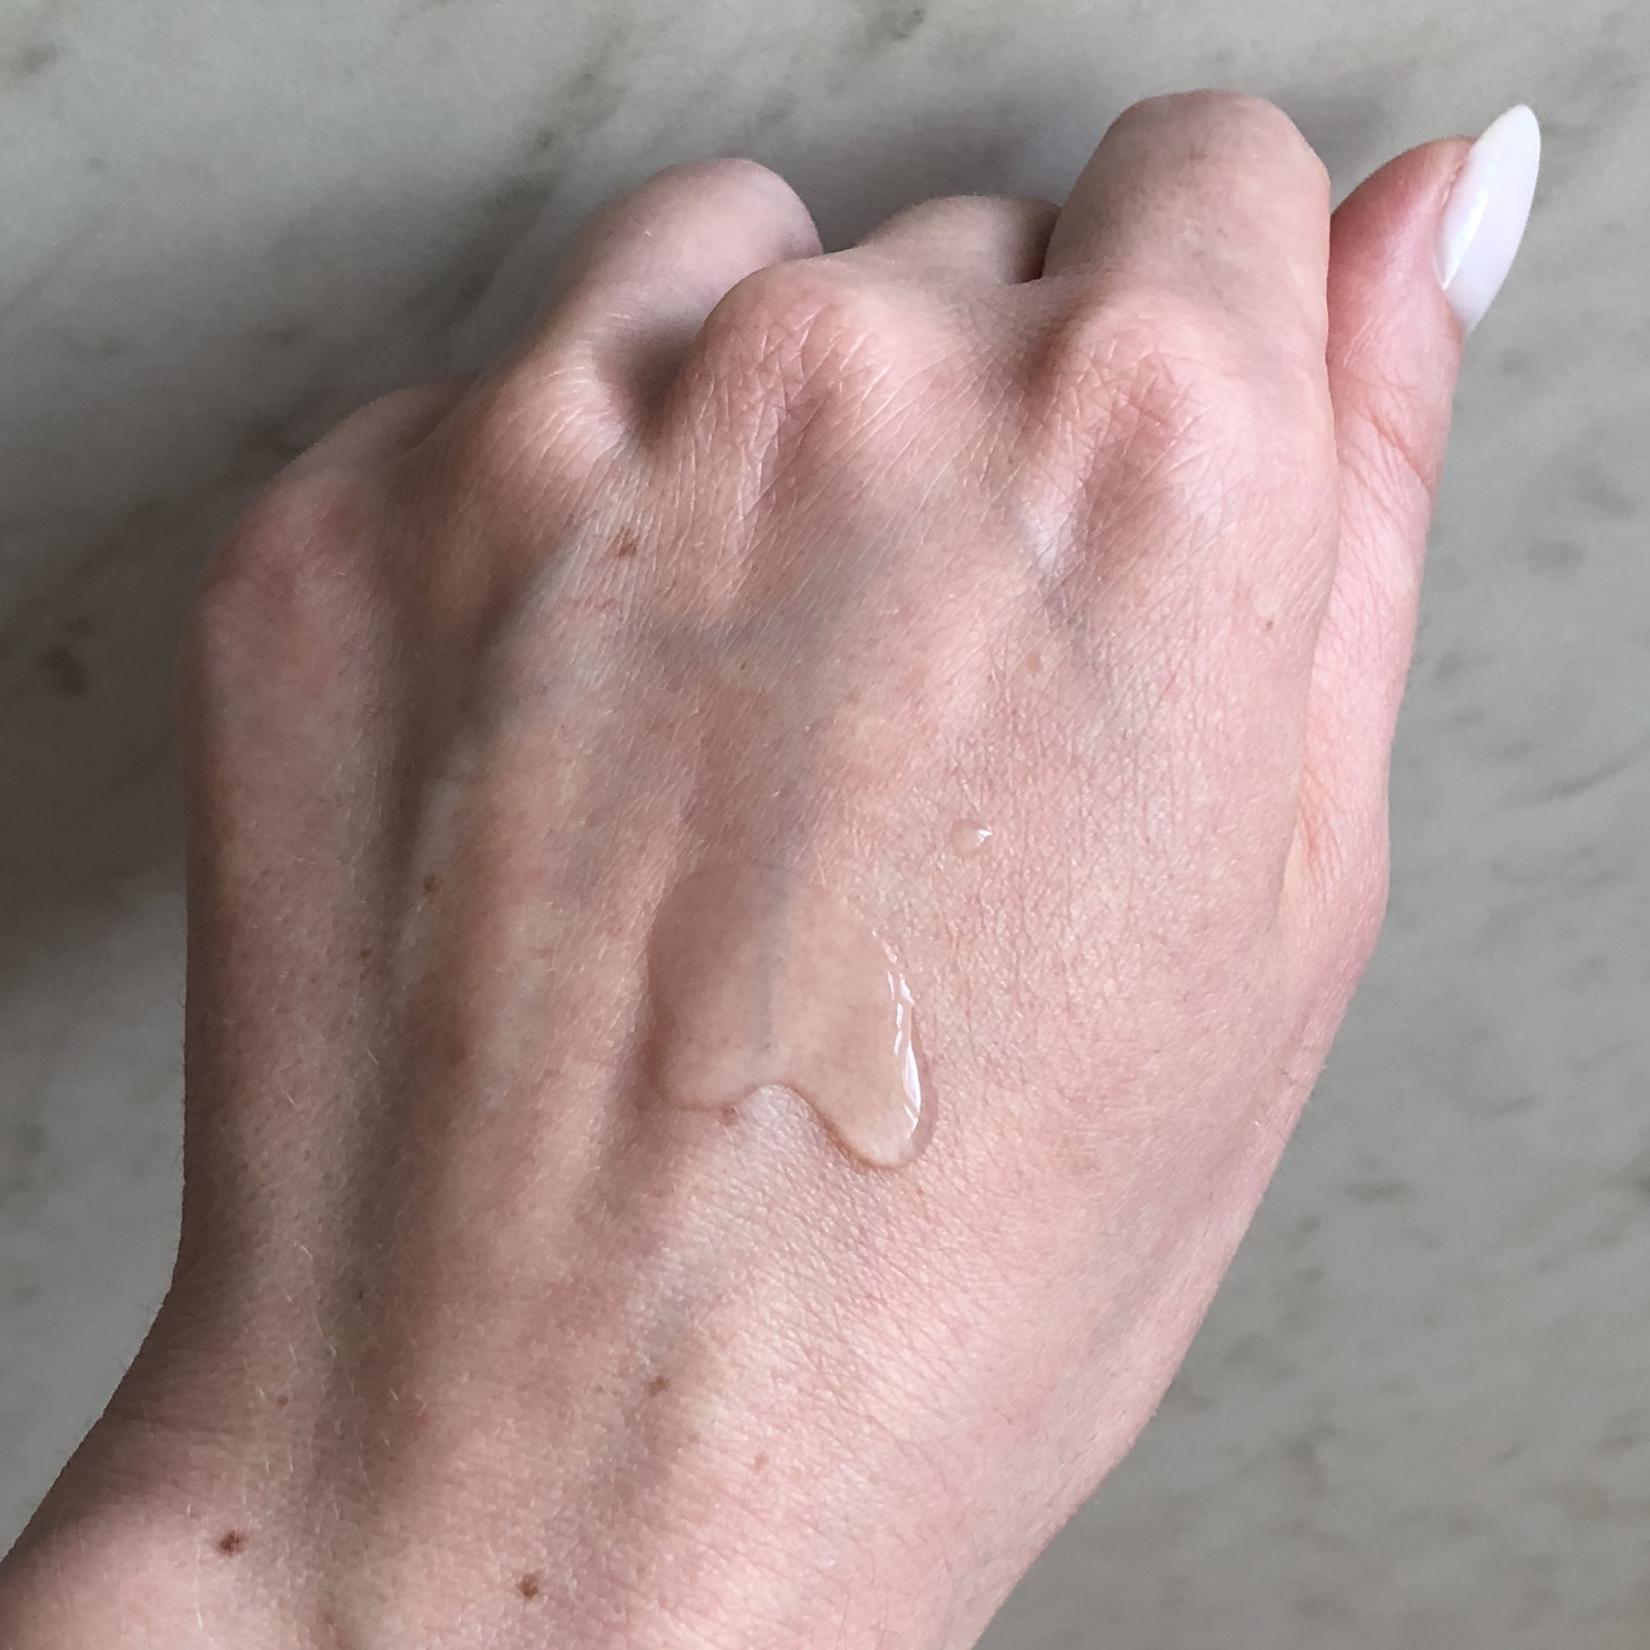 The Ordinary Salicylic Acid 2% Solution, кислотный уход для лица - консистенция